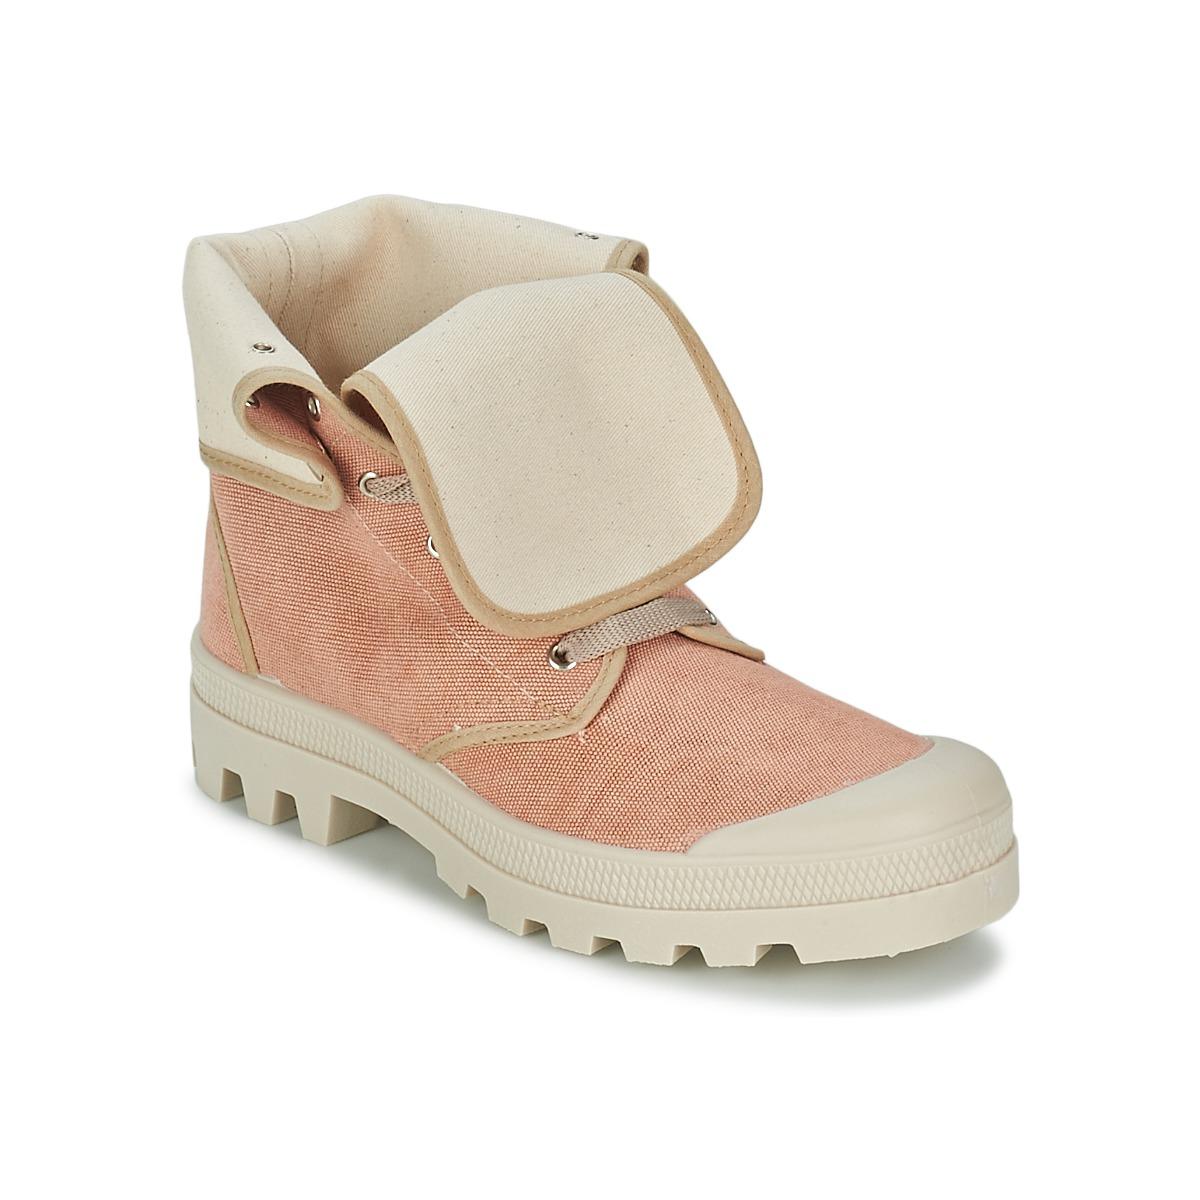 Casual Attitude BOPESSA Rose - Kostenloser Versand bei Spartoode ! - Schuhe Sneaker High Damen 32,99 €